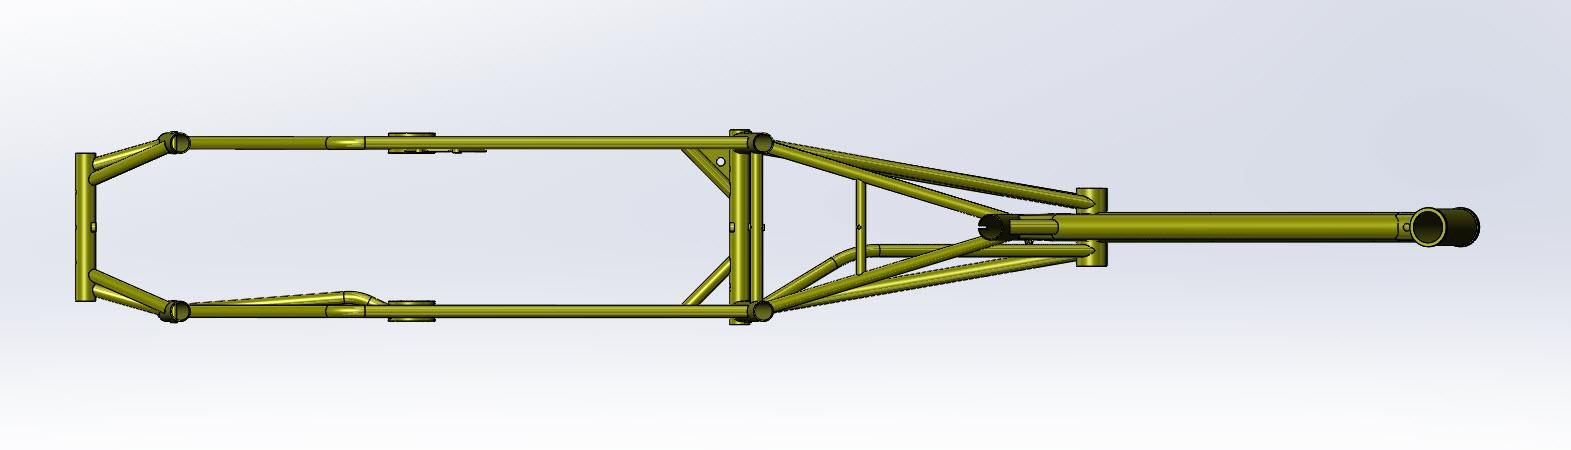 CAD illustration of a Surly Bike Fat Dummy bike frame - overhead view